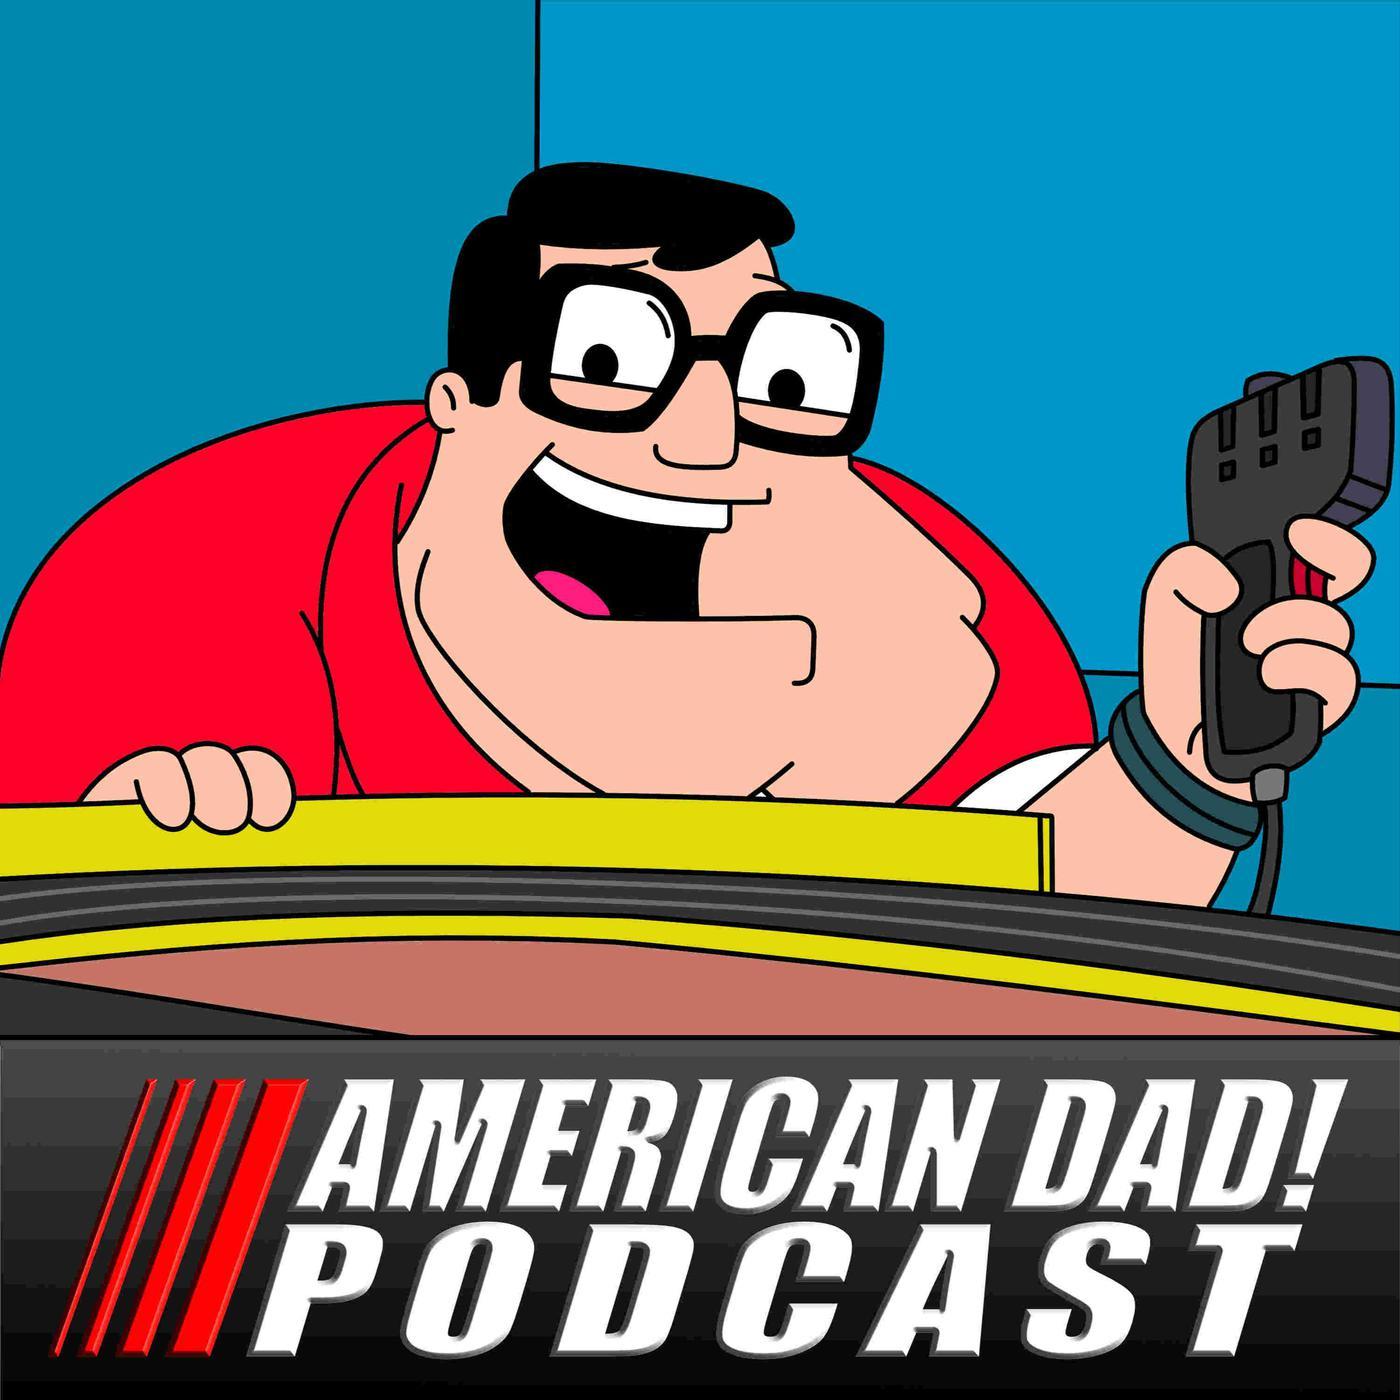 American Dad american dad! (podcast) - american dad podcasters | listen notes